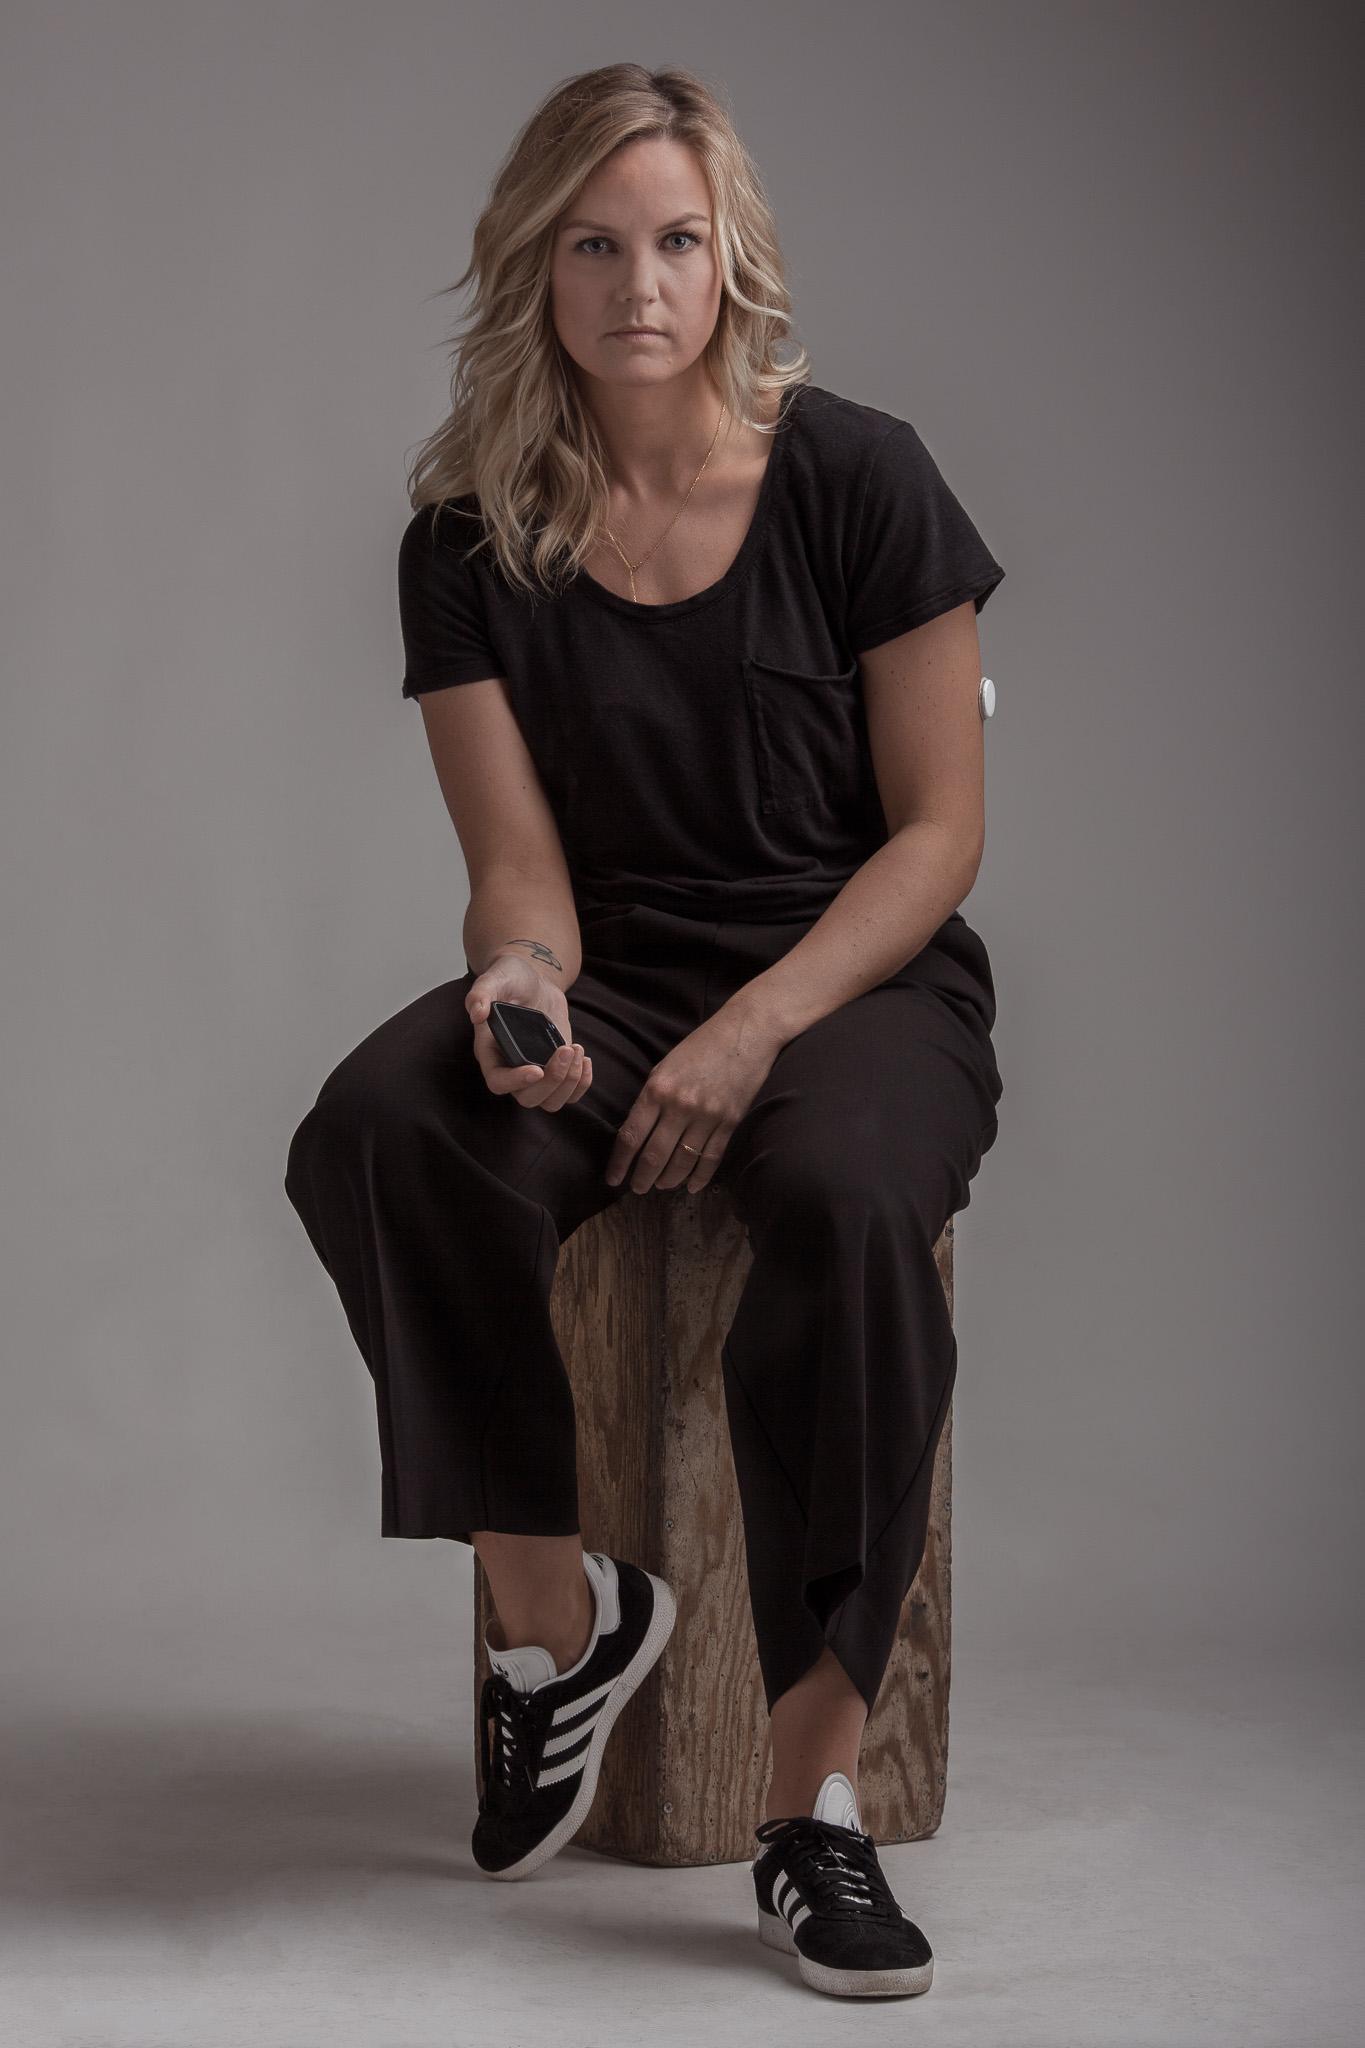 En bild för diabetes - Nina Sikkeland. Foto: Calle Appelqvist